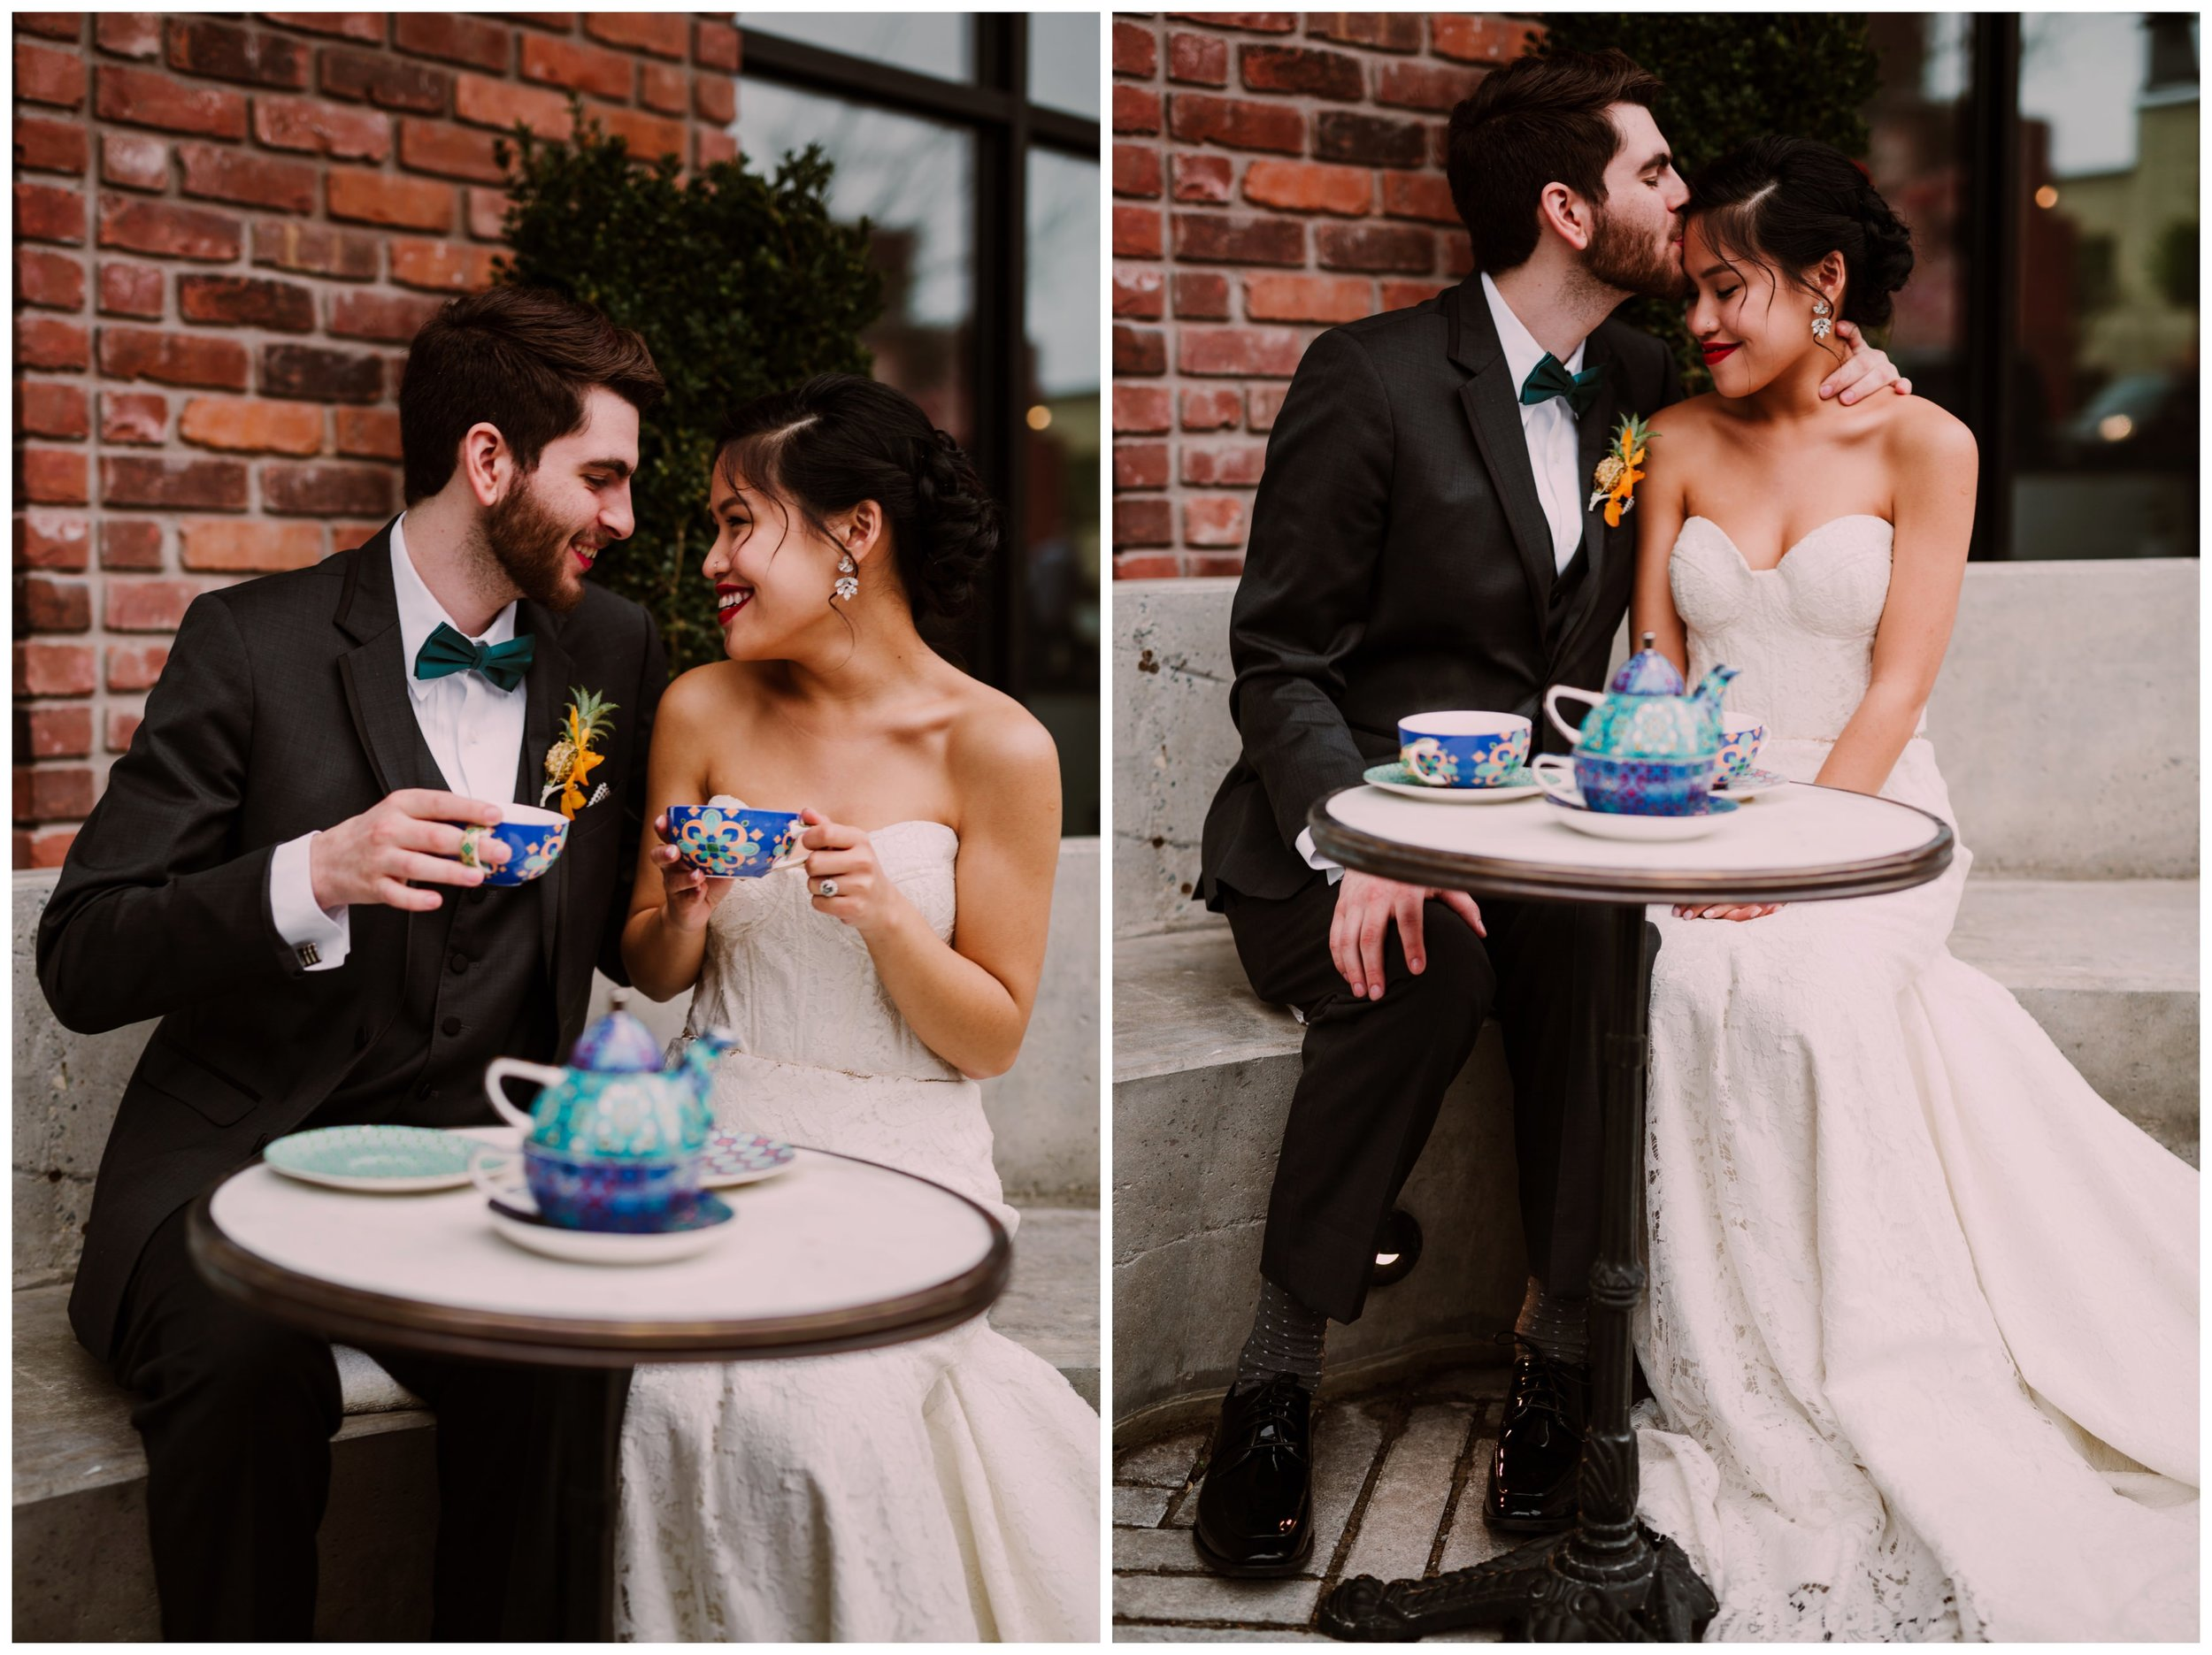 Williamsburg Hotel Wedding Feature on Catalyst Wedding Co.   Styled ShootWilliamsburg Hotel Wedding Feature on Catalyst Wedding Co.   Styled Shoot